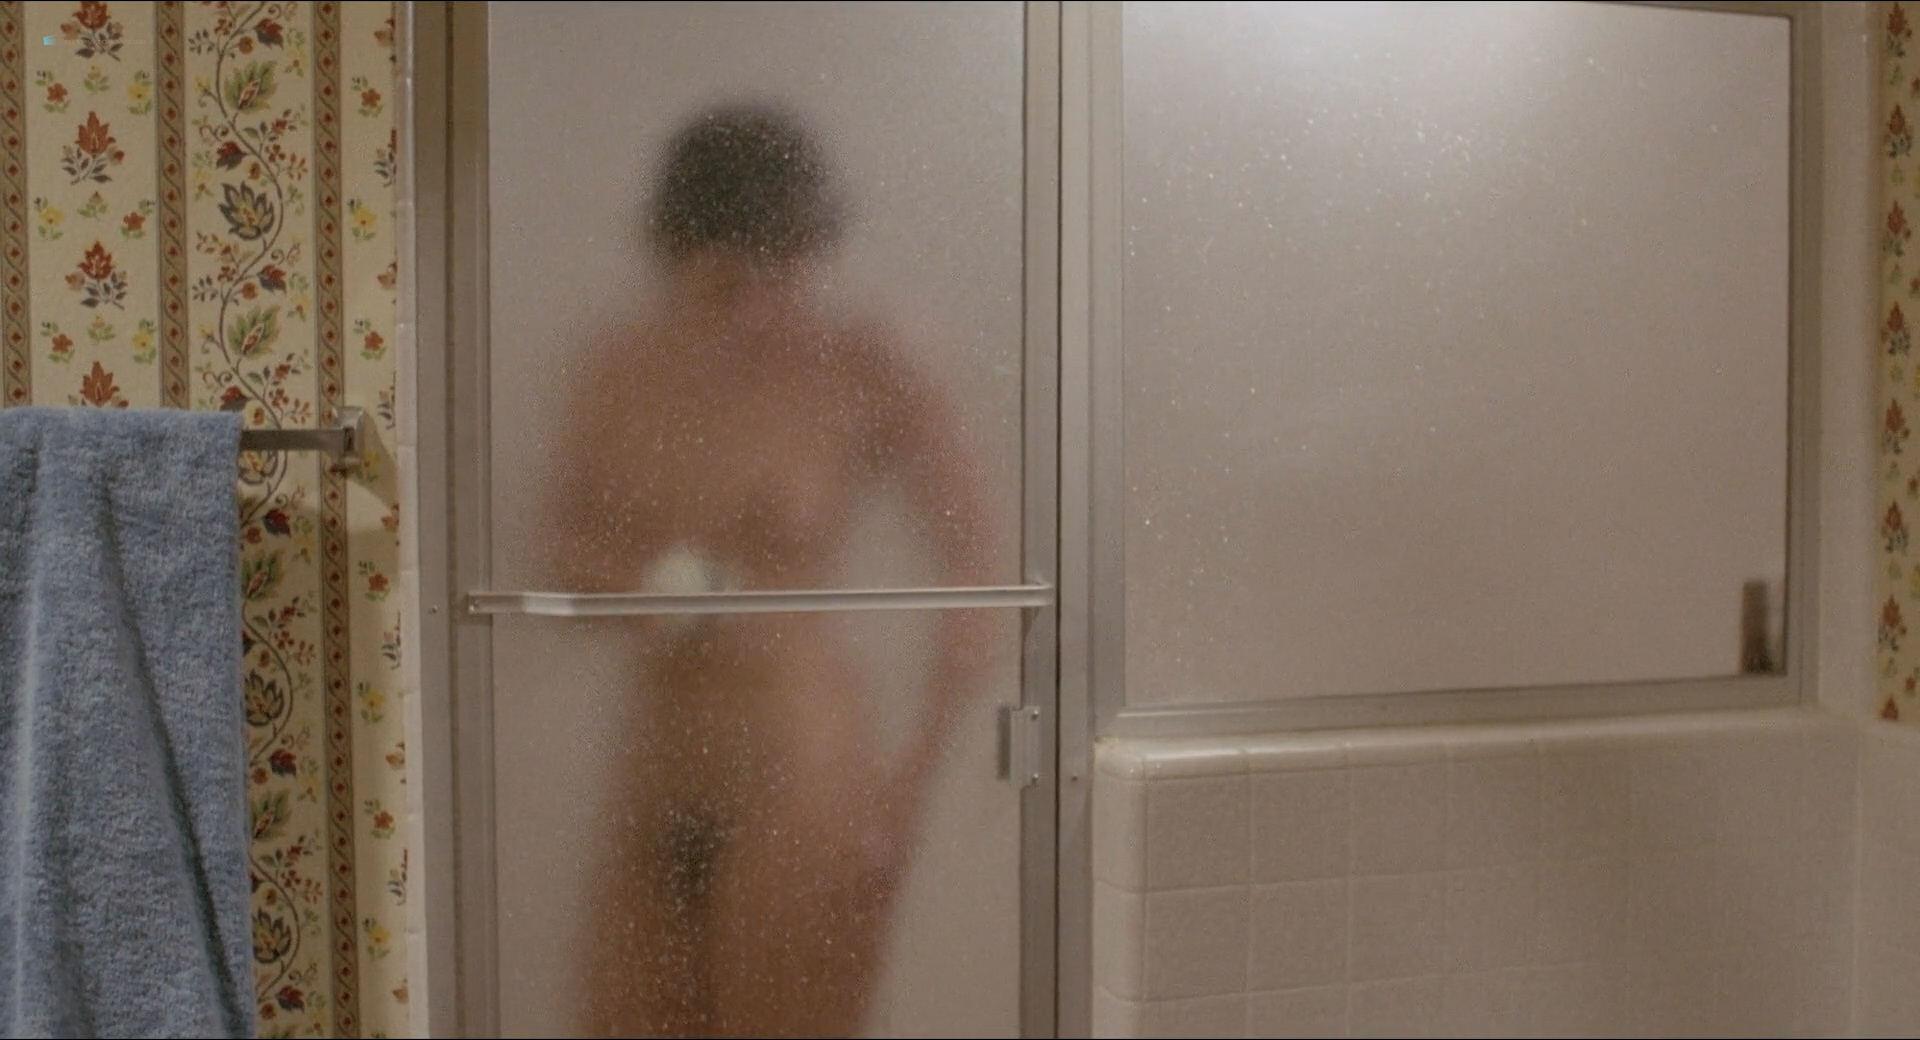 Nude elizabeth daily Elizabeth Daily